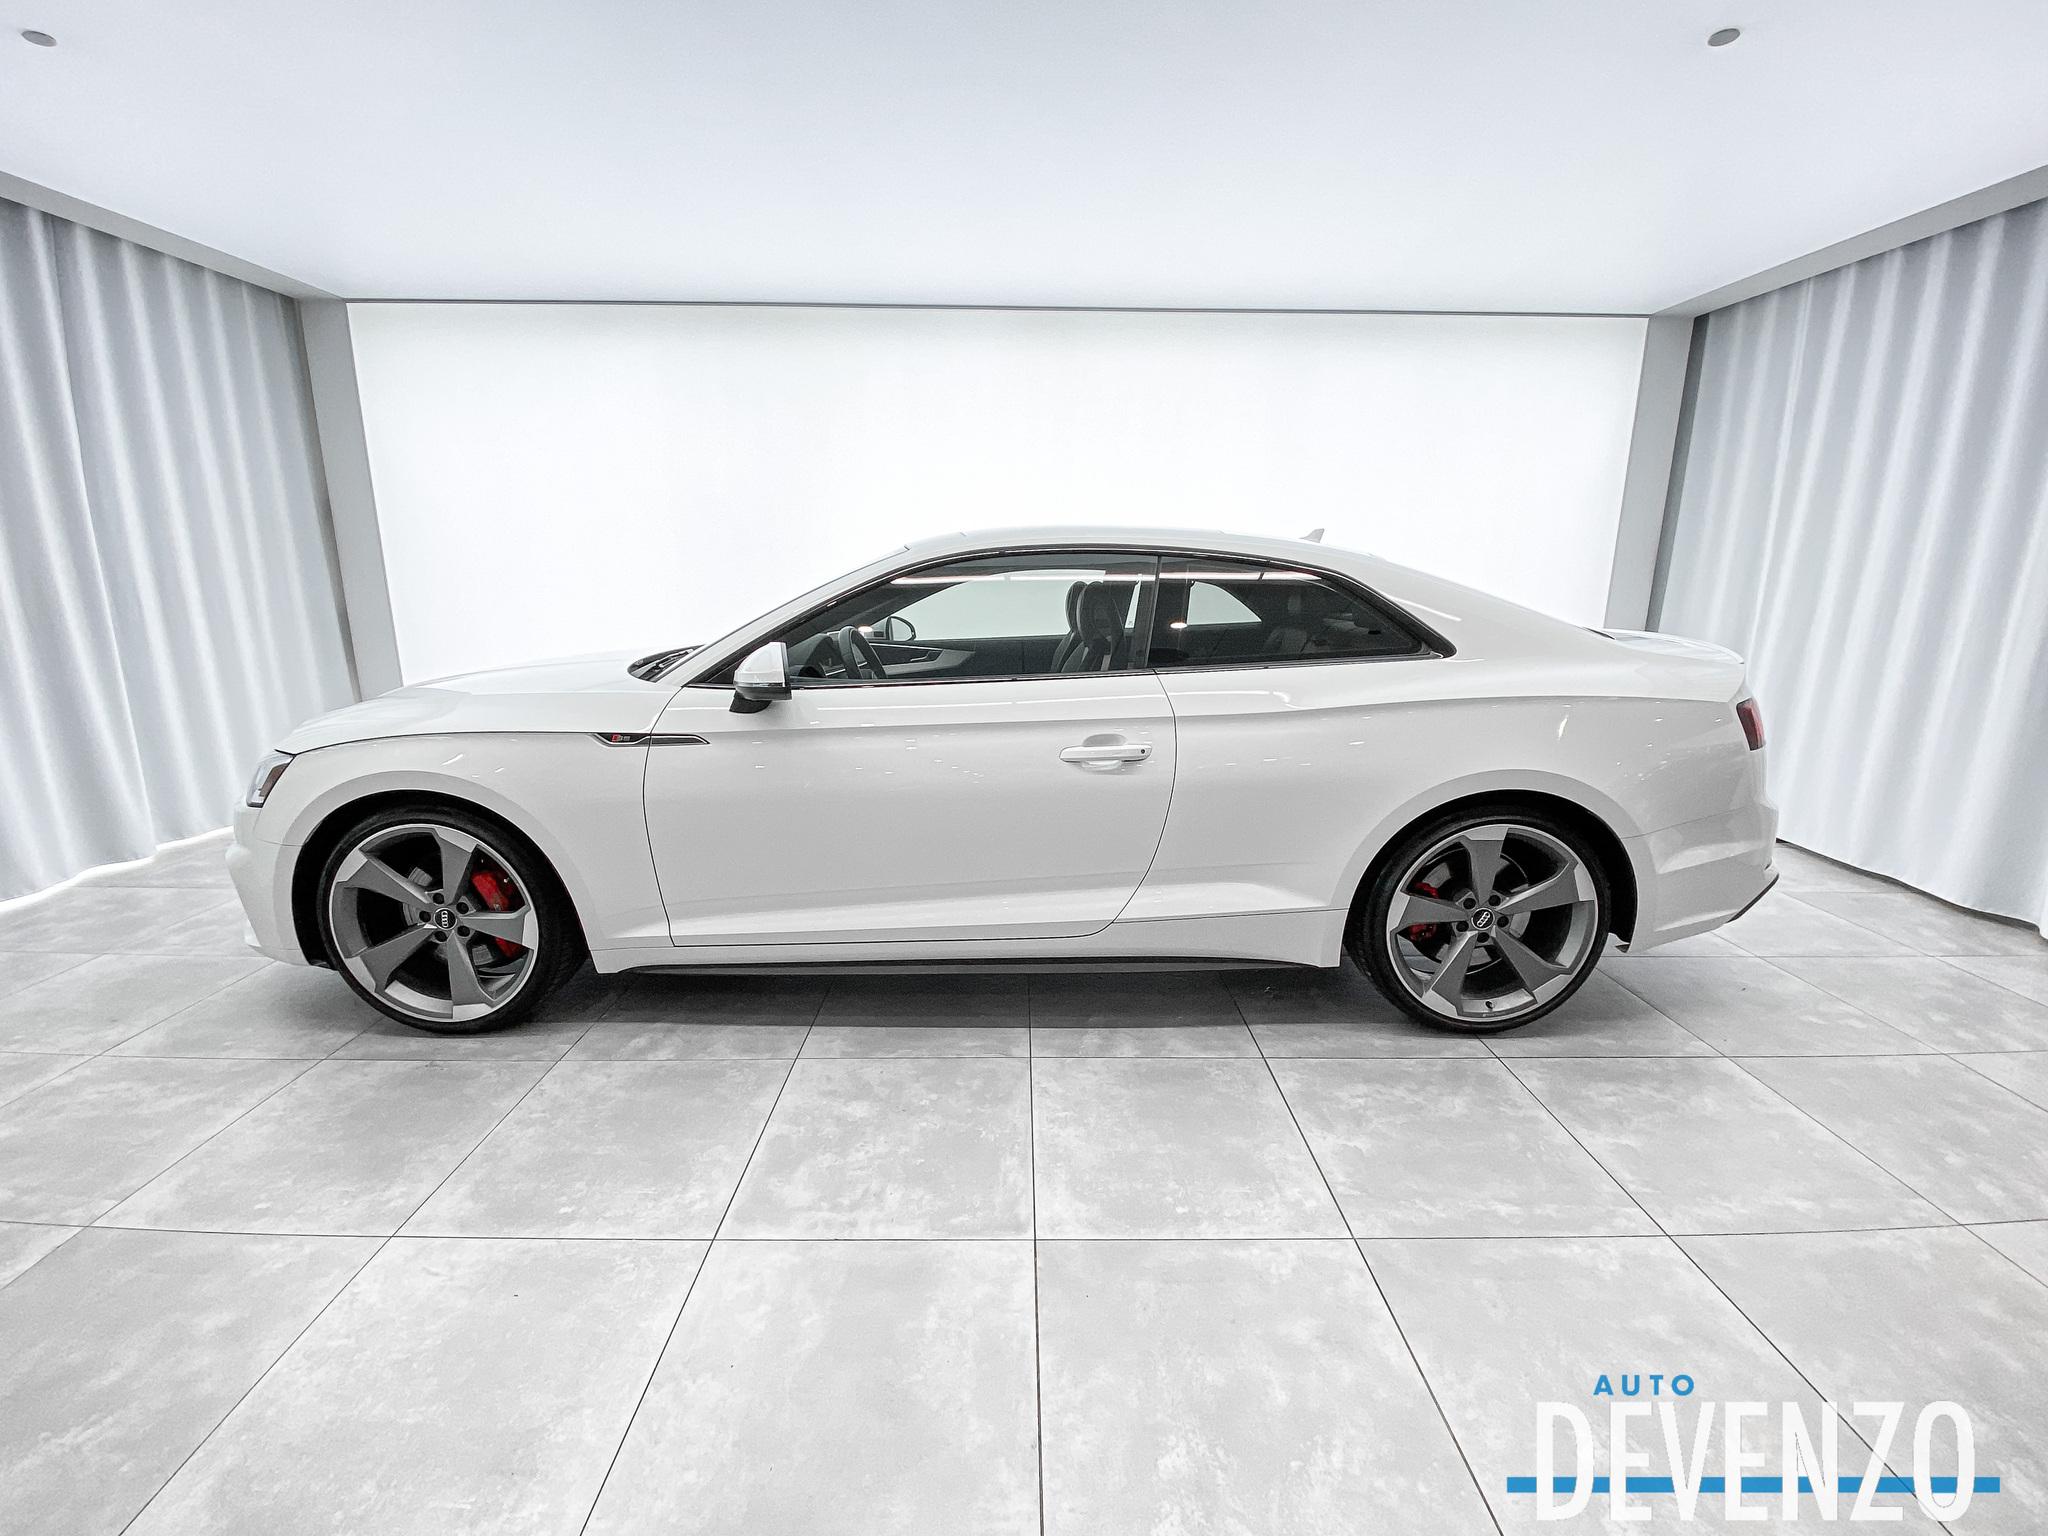 2019 Audi S5 Coupe S5 Coupe Technik 3.0 TFSI QUATTRO B&O BLACK OPTICS complet